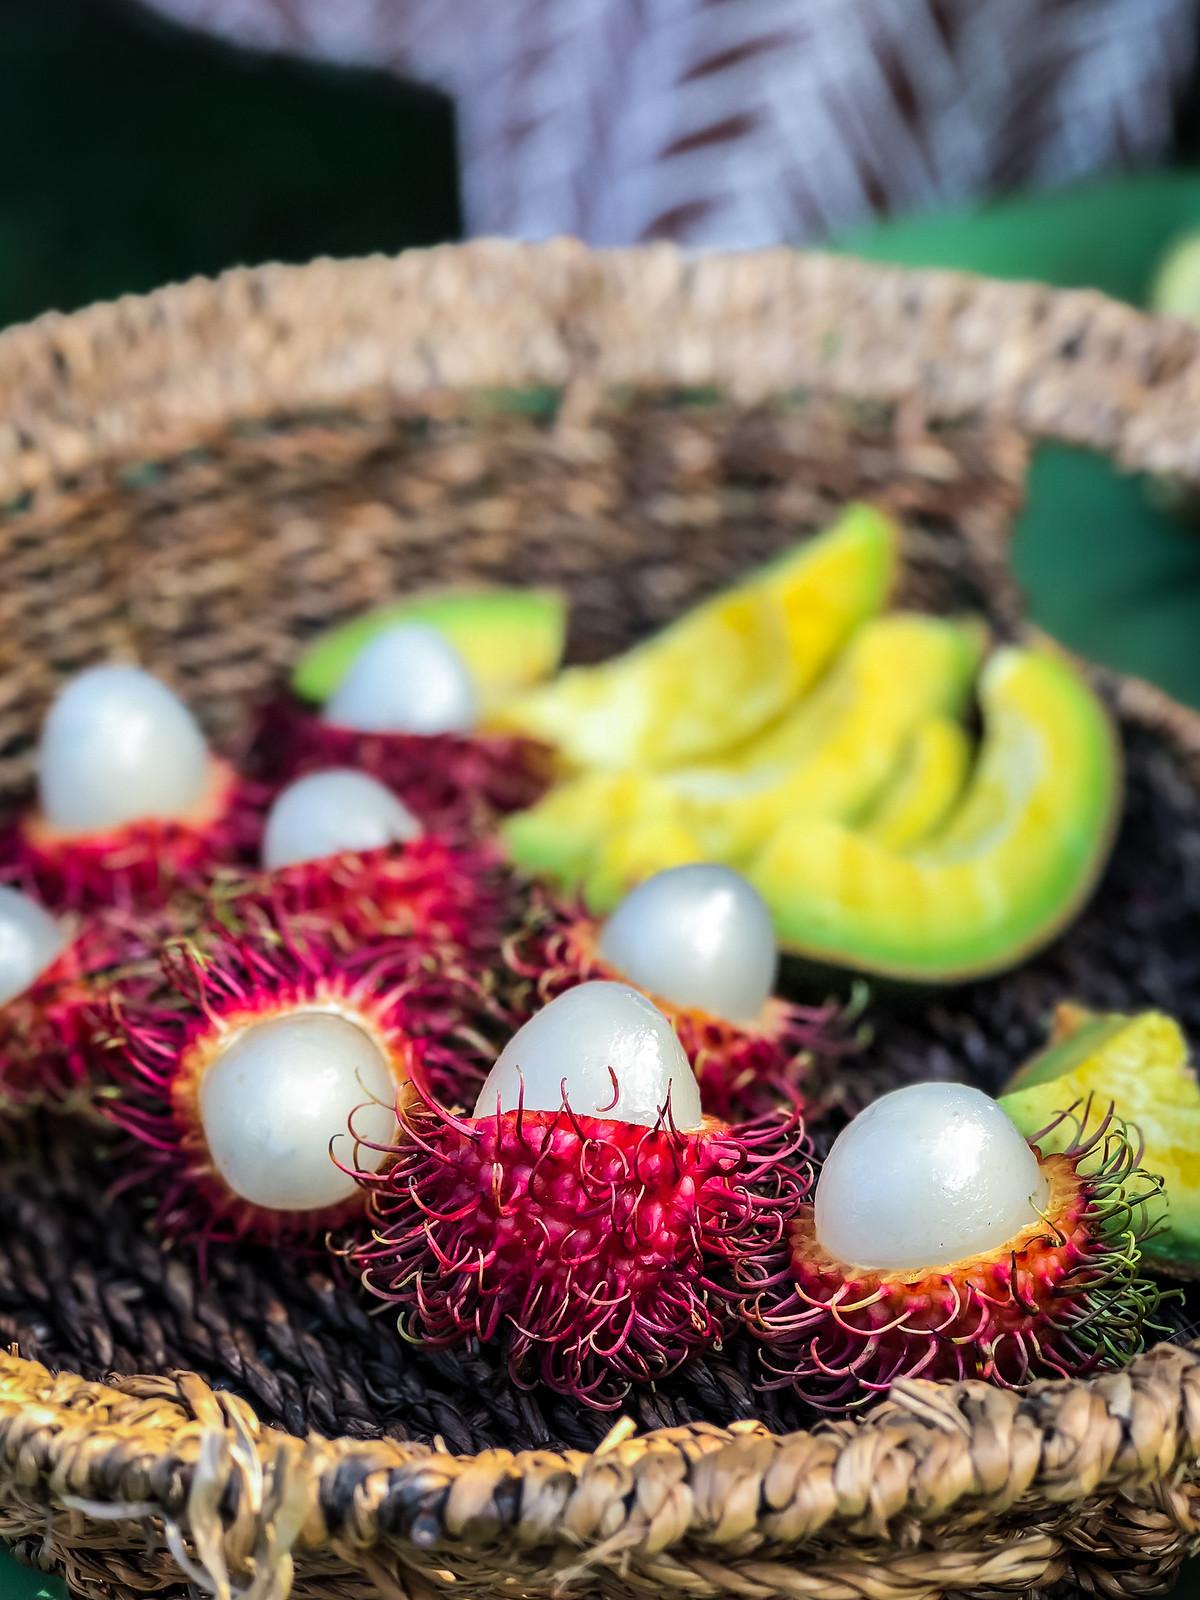 fresh rambutan may look bizarre, but they're sweet and juicy